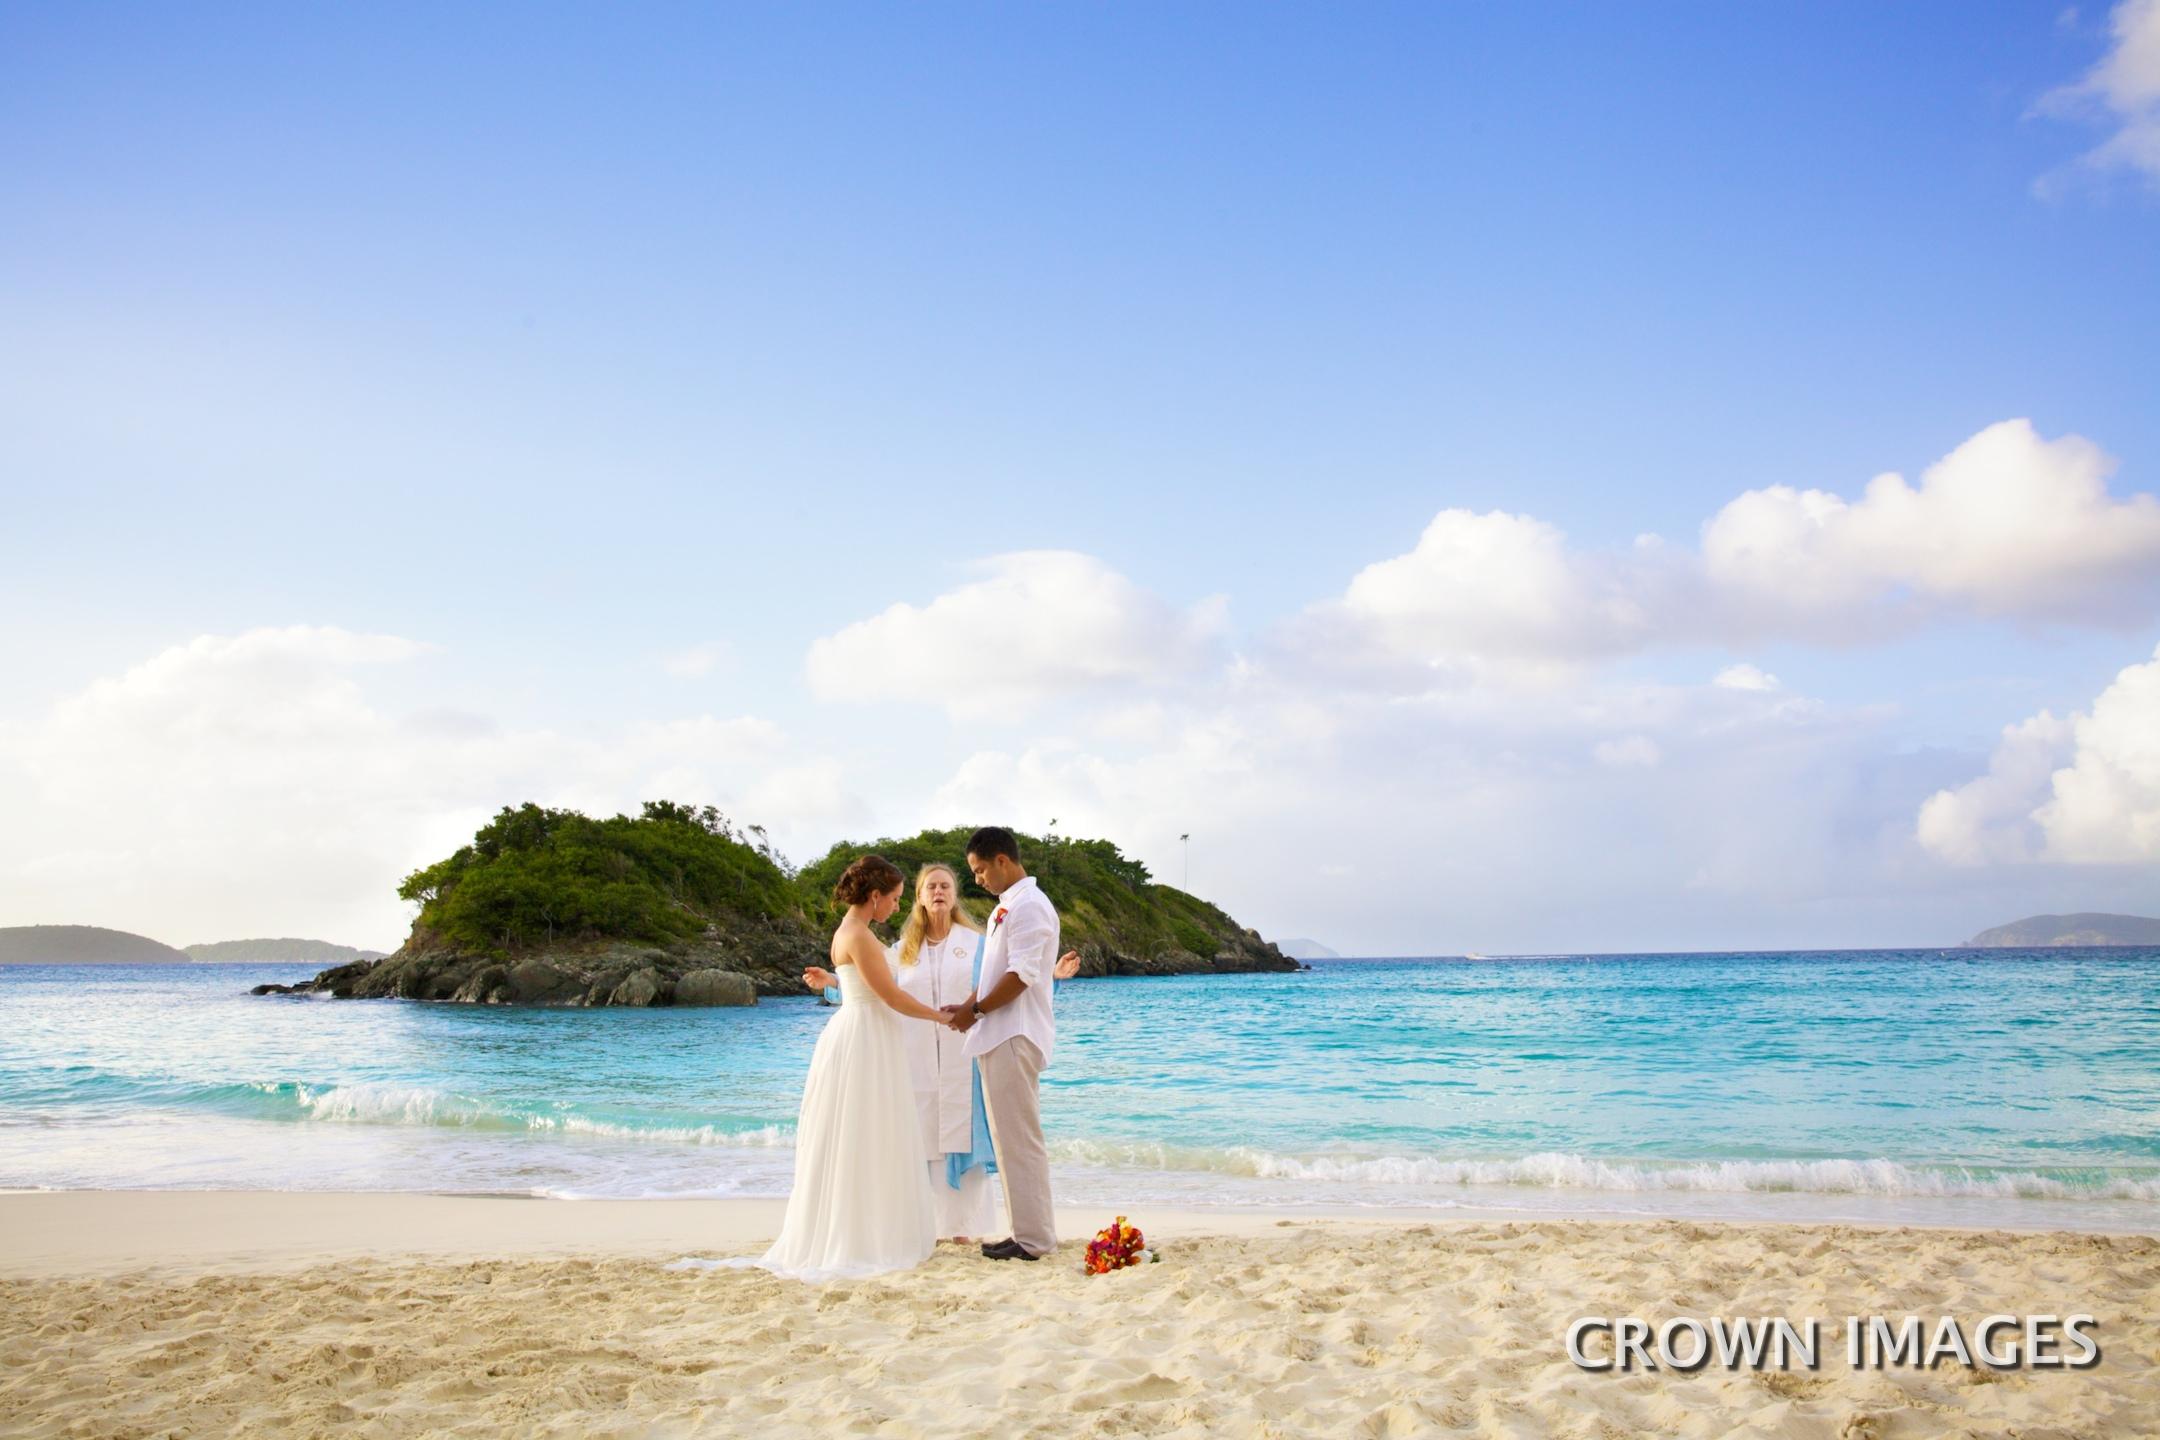 st john wedding on trunk beach IMG_0442.jpg